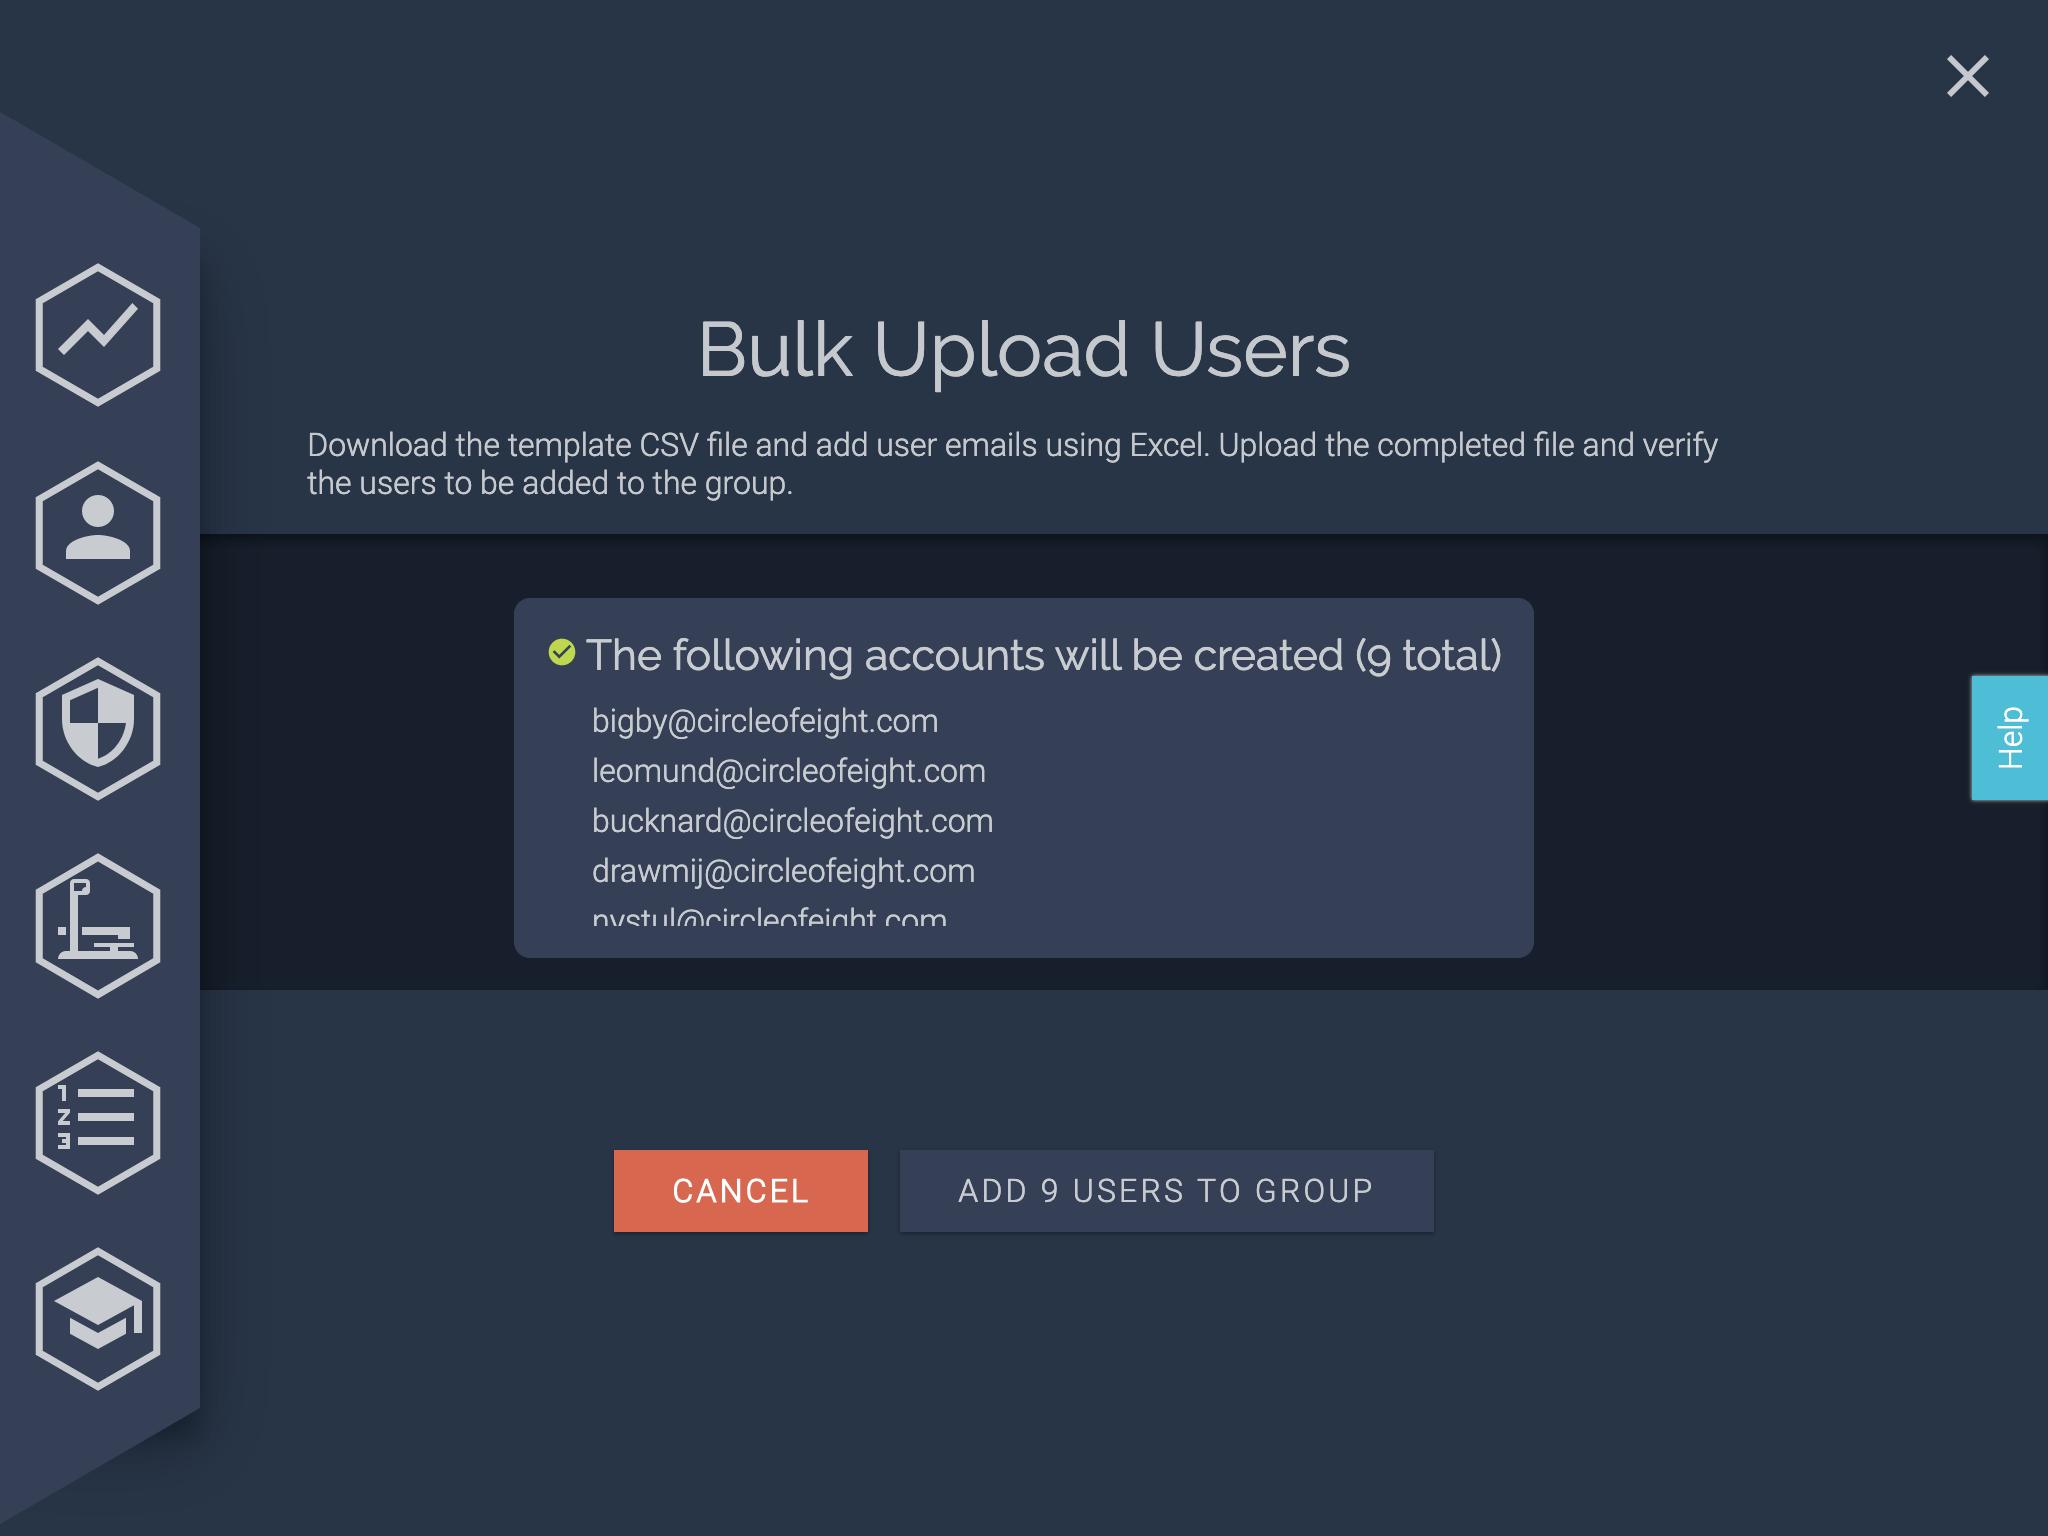 bulk upload confirm page